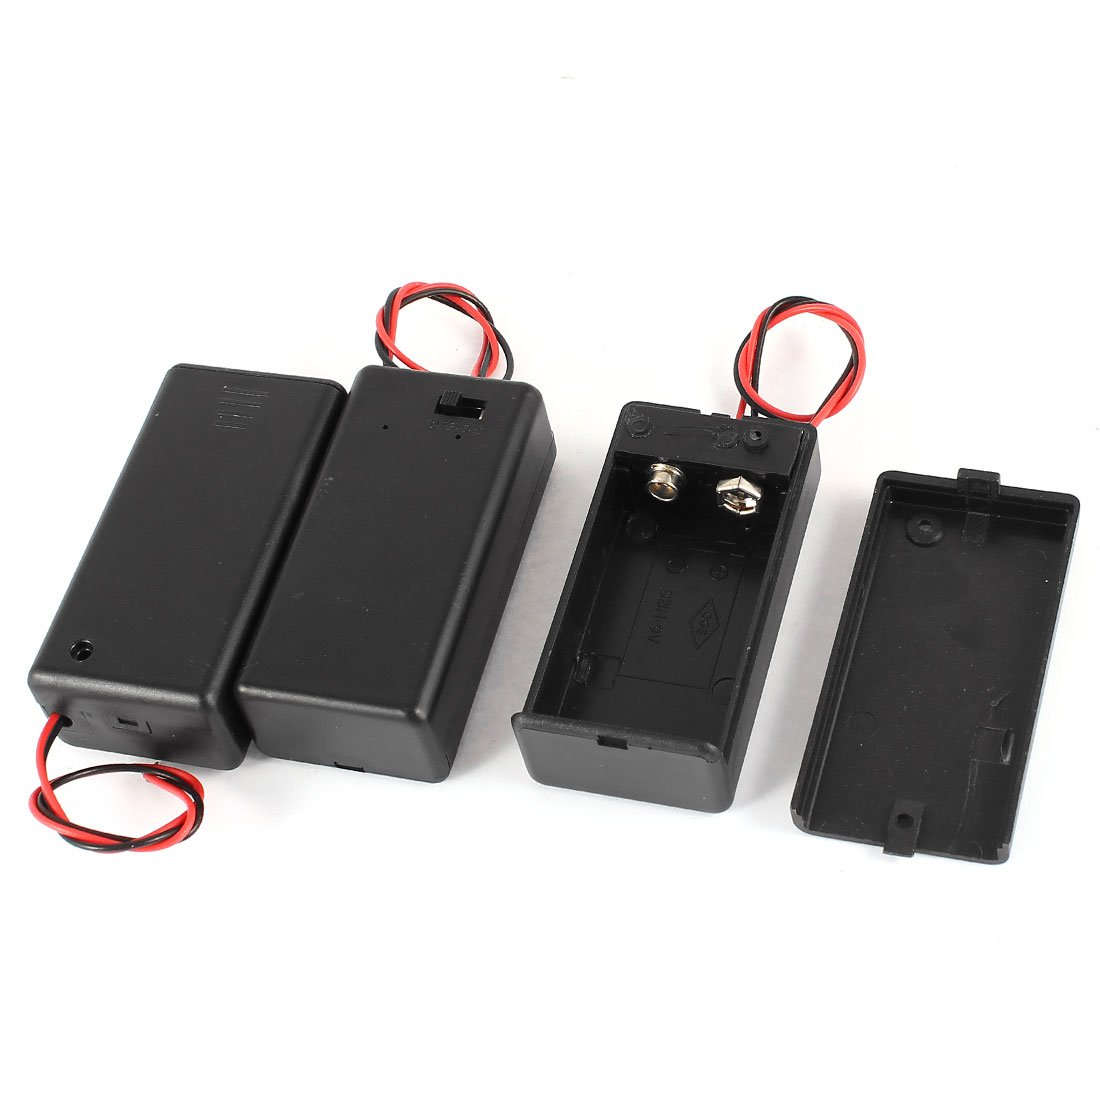 3 Stücke 2 Draht On/Off Schalter 1 x 9V: Amazon.de: Elektronik